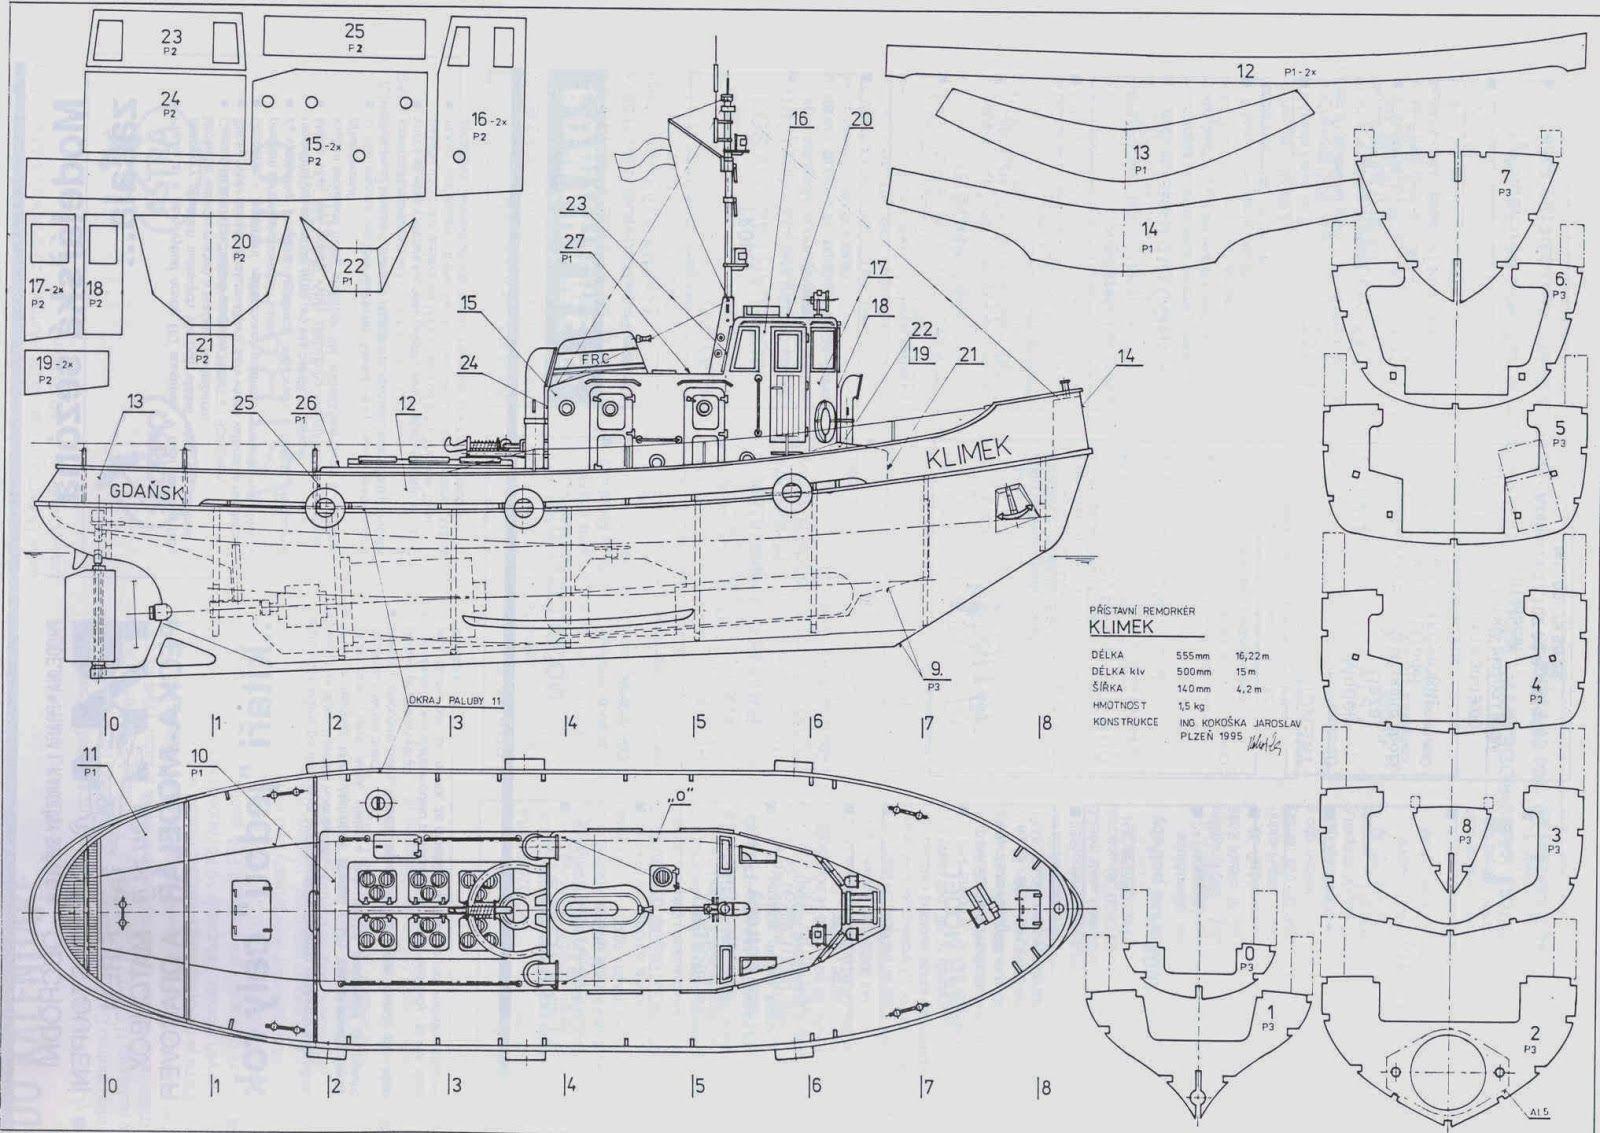 Free boat blueprints iin resim sonucu general arrangement free boat blueprints iin resim sonucu malvernweather Gallery